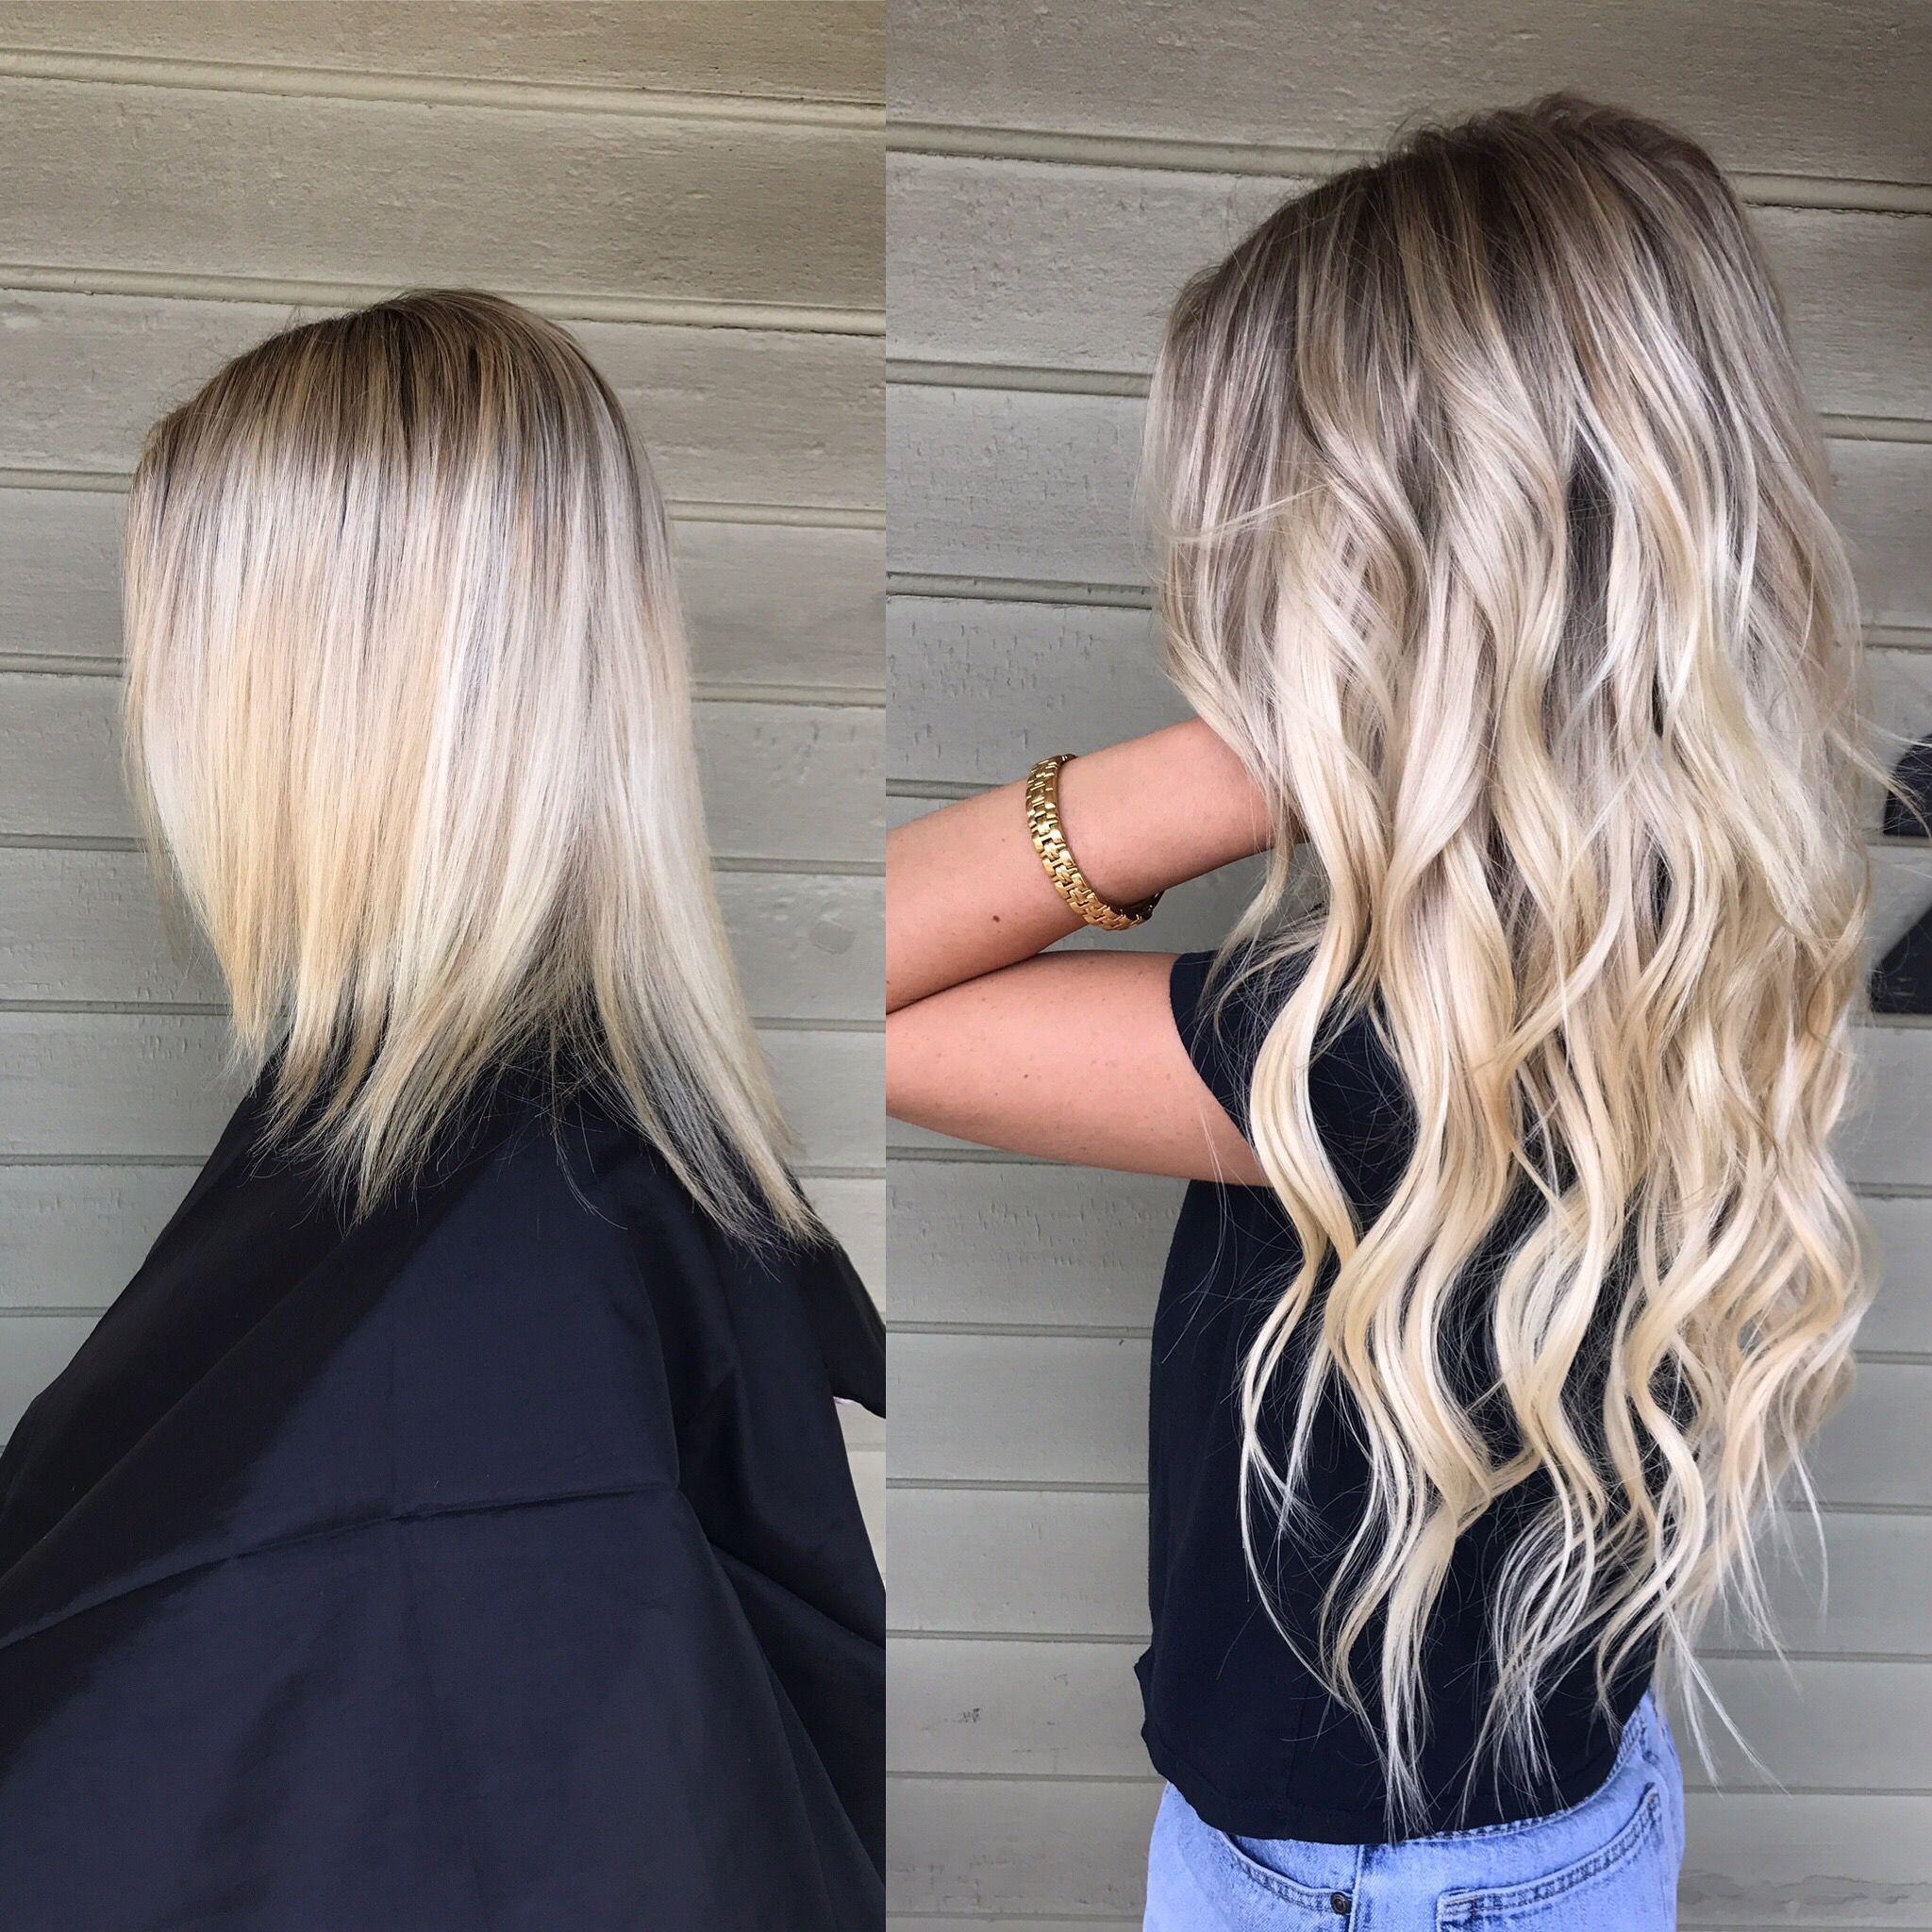 blonde & dreamcatchers hair extensions